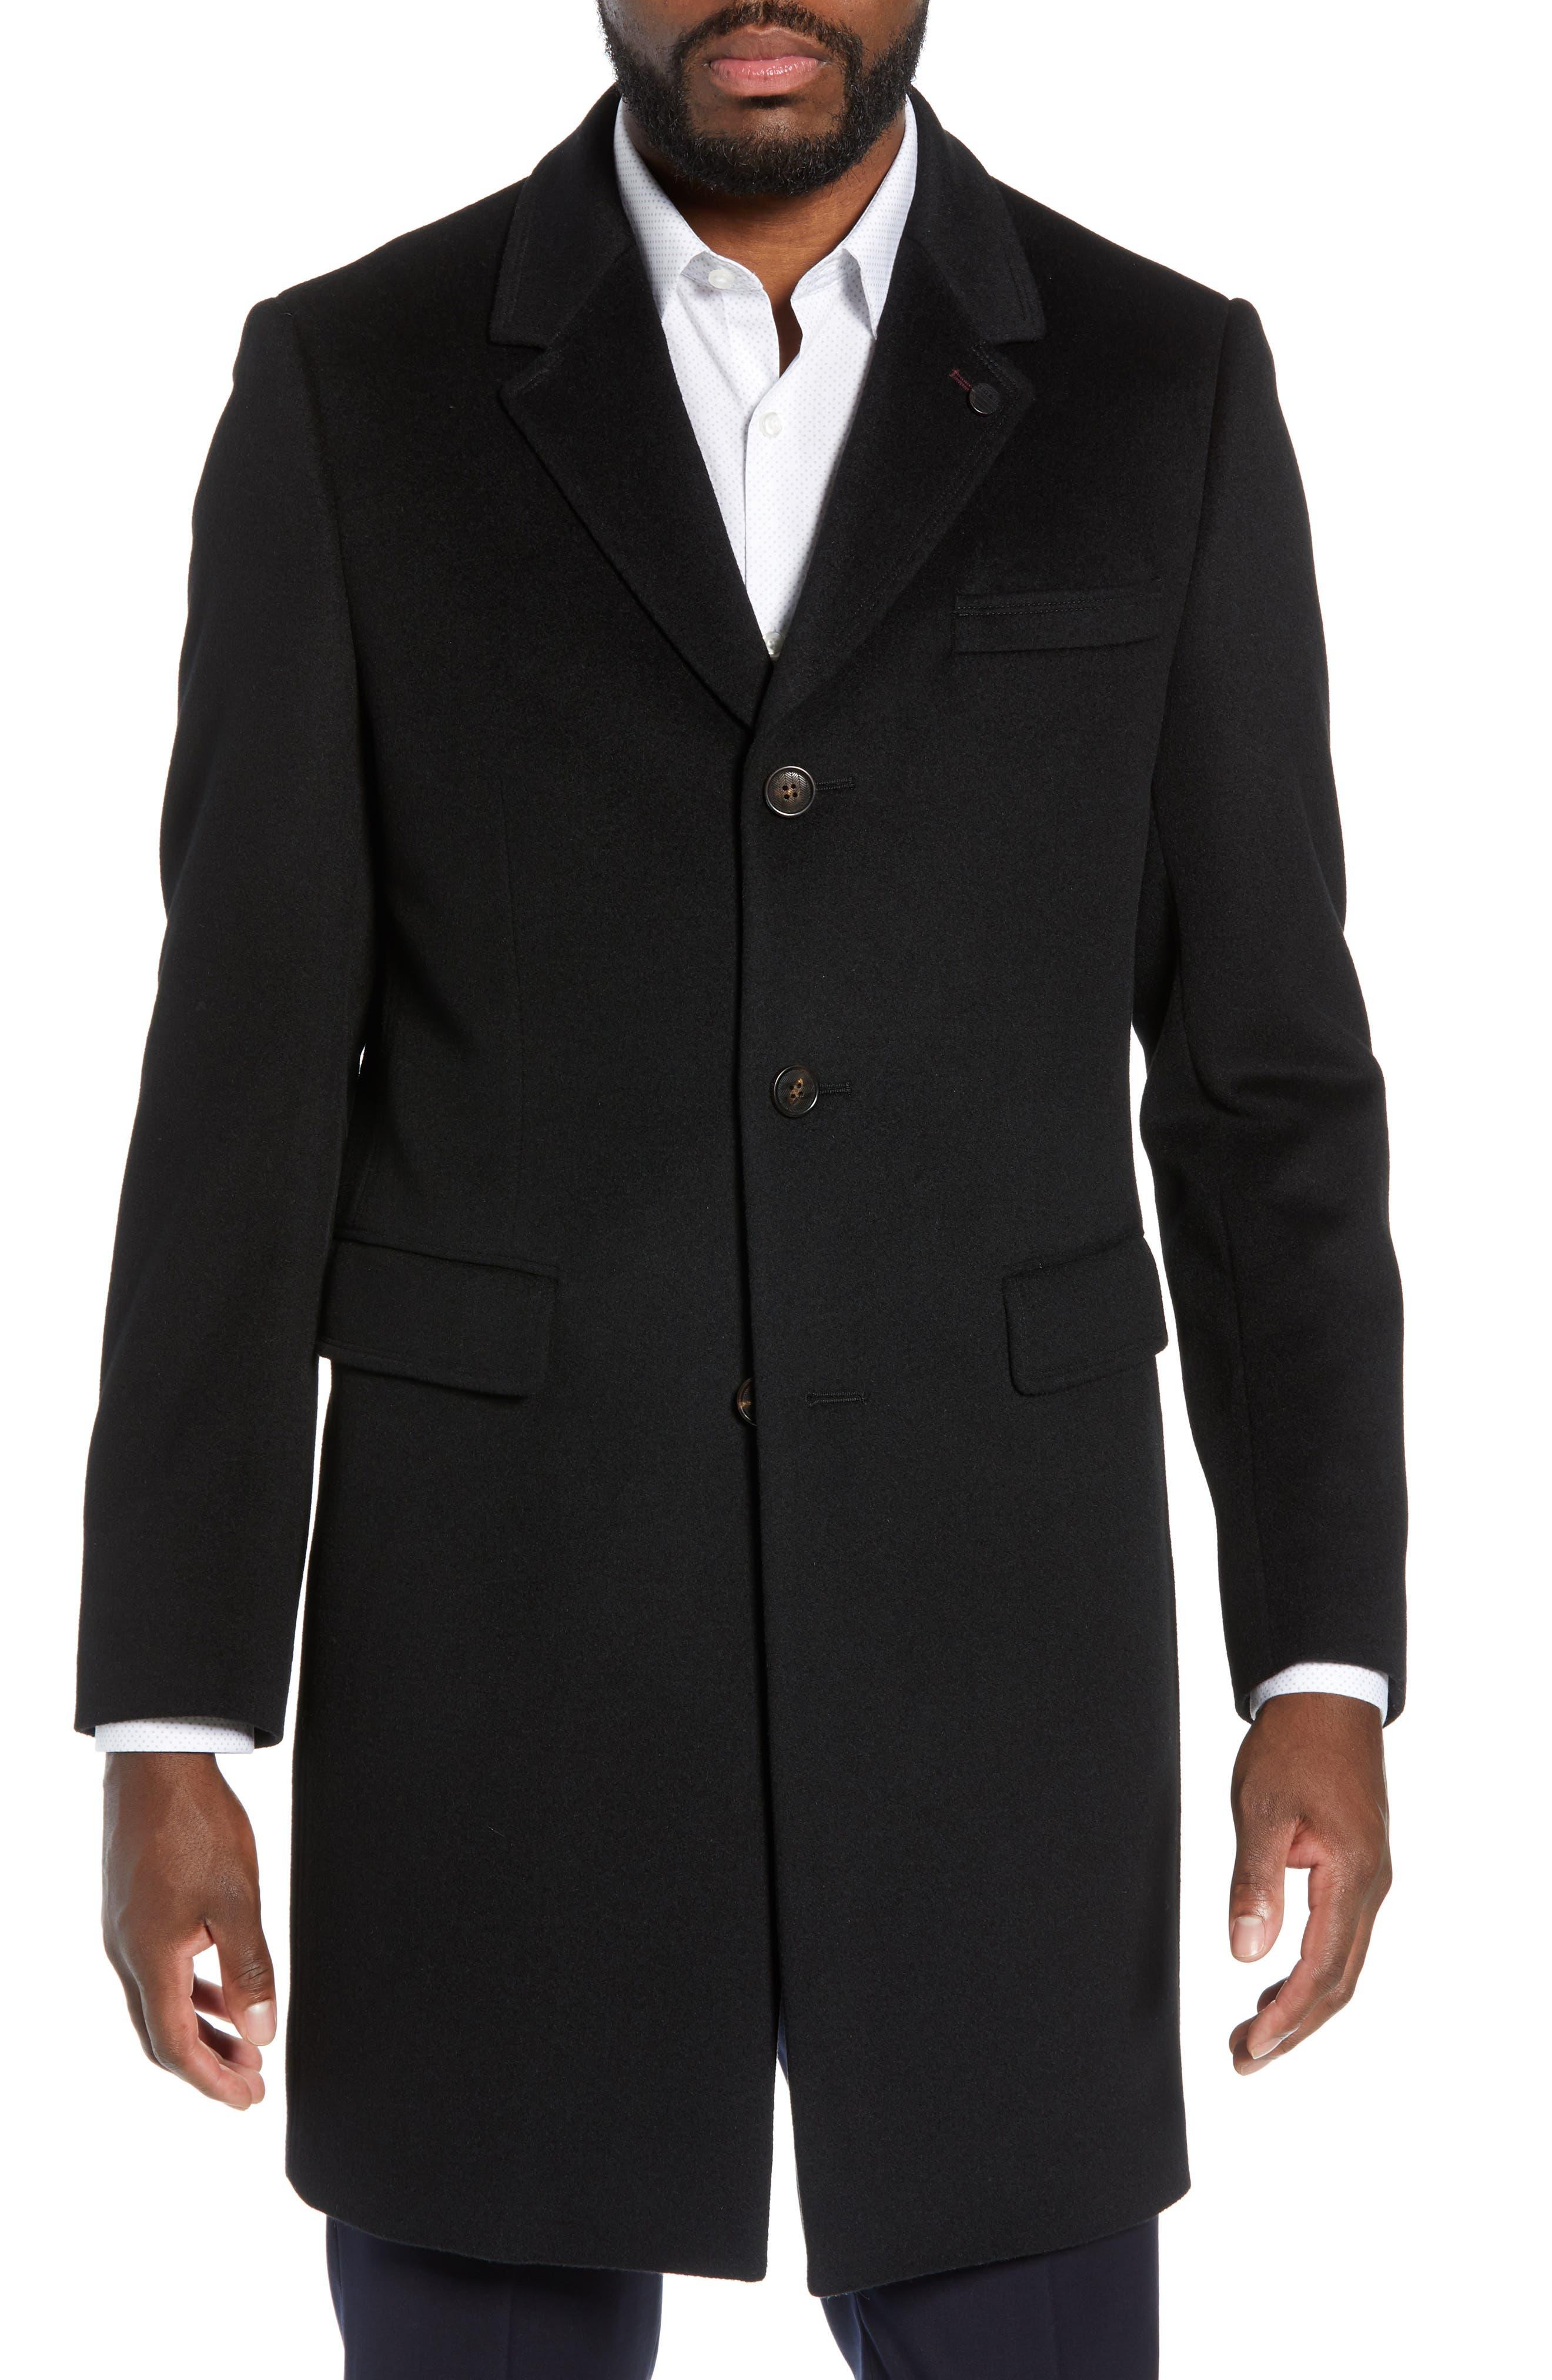 Swish Wool & Cashmere Overcoat,                         Main,                         color, 001